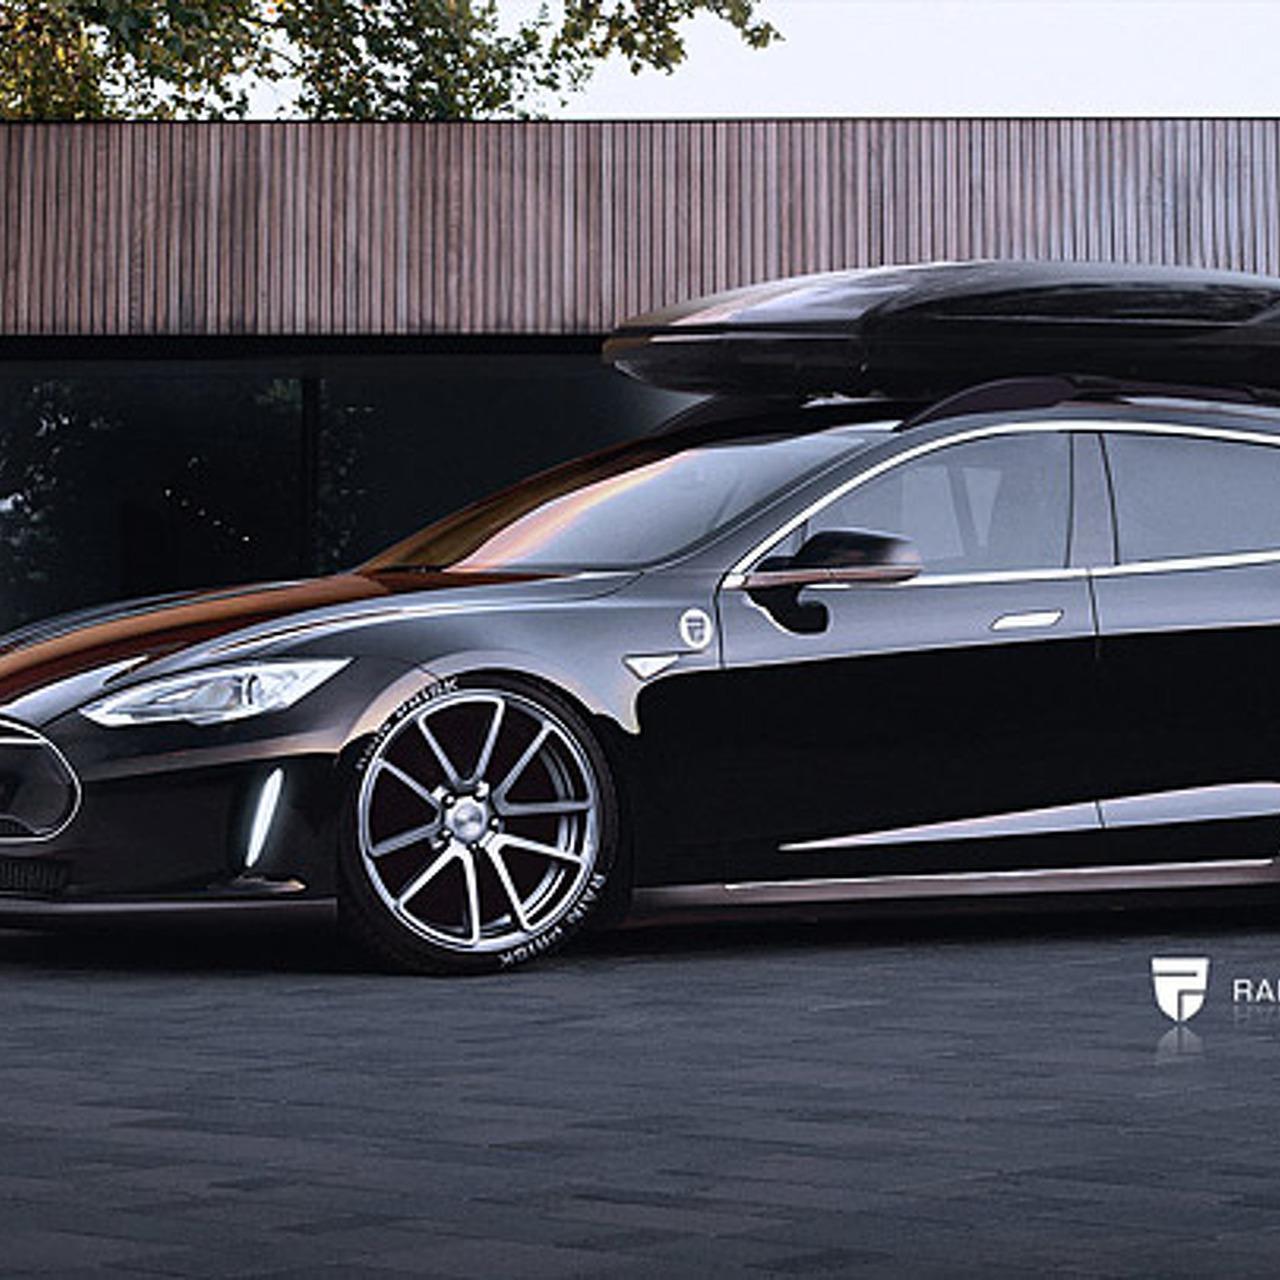 Tesla Model S Wagon: The Perfect Car or Perfectly Frivolous?